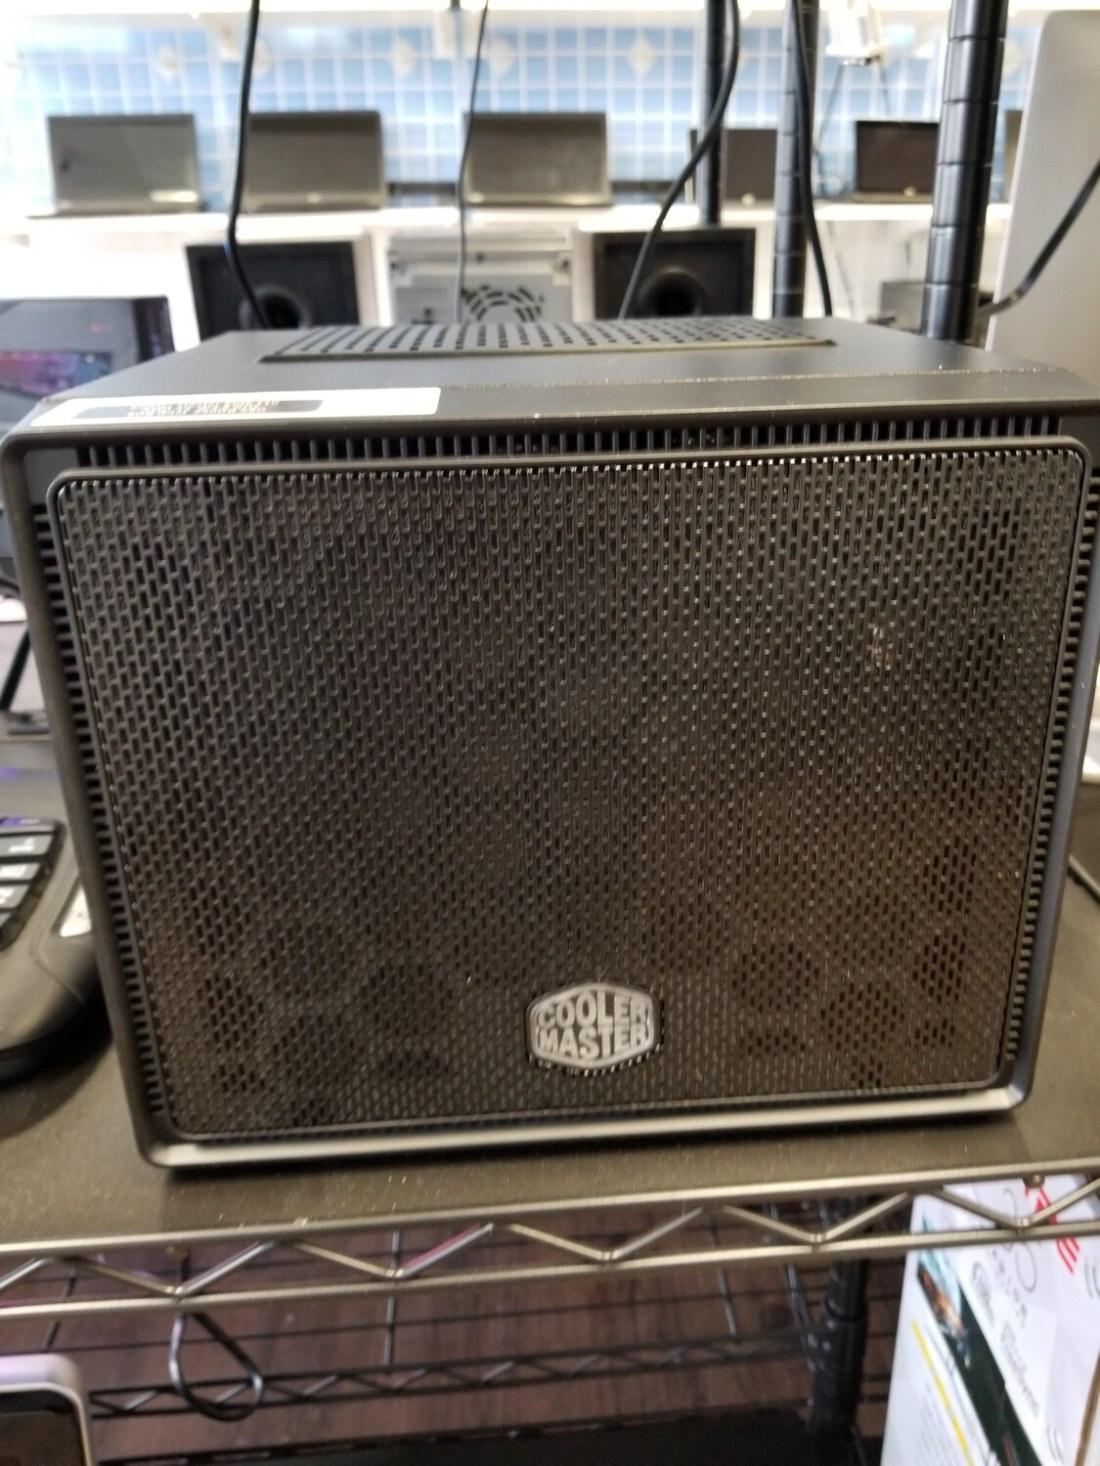 Cool Master Mini-ITX Computer Cooler Master Elite 110 AMD A4 @3.8GHz 8GB Ram 240GB SSD